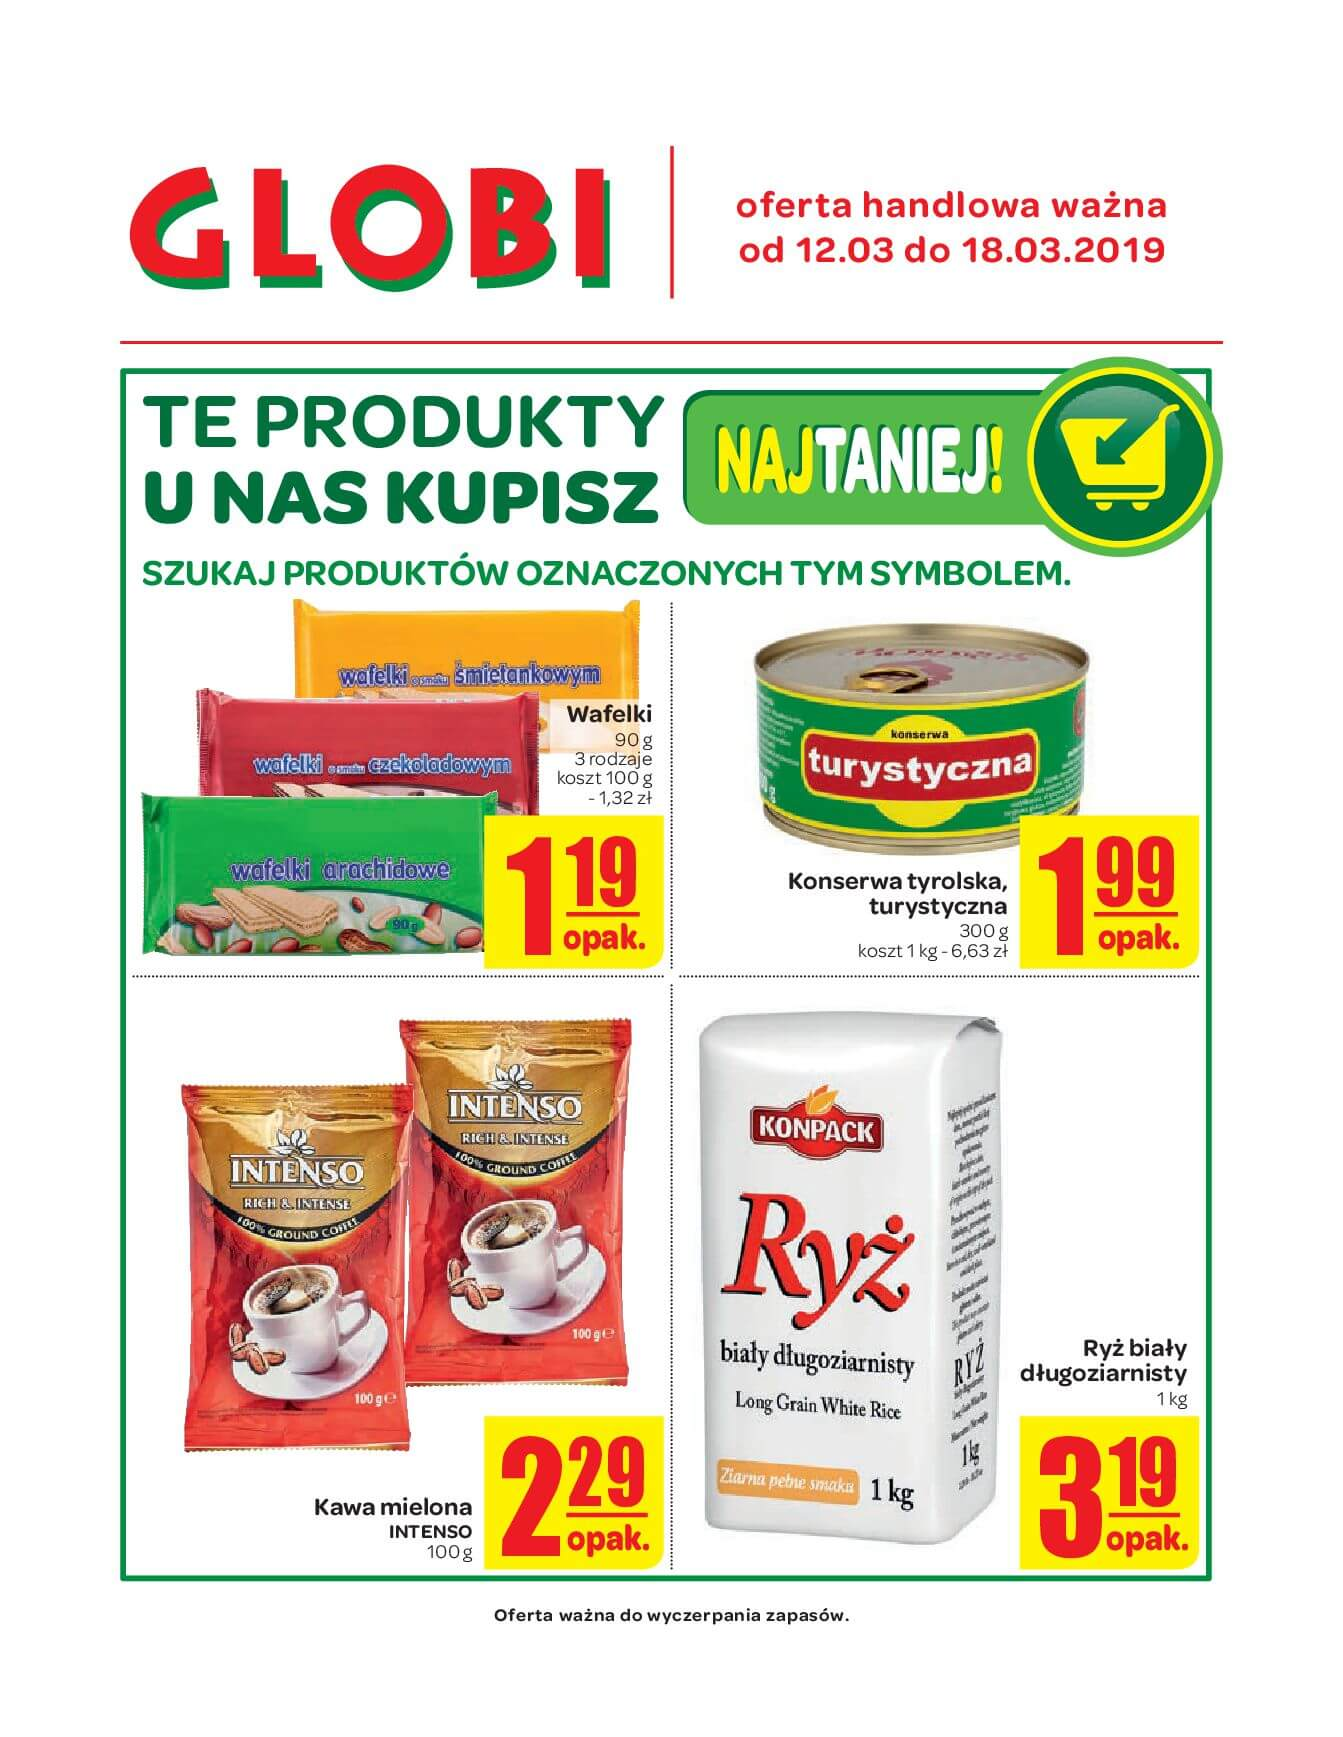 Gazetka Globi - Oferta handlowa-11.03.2019-18.03.2019-page-